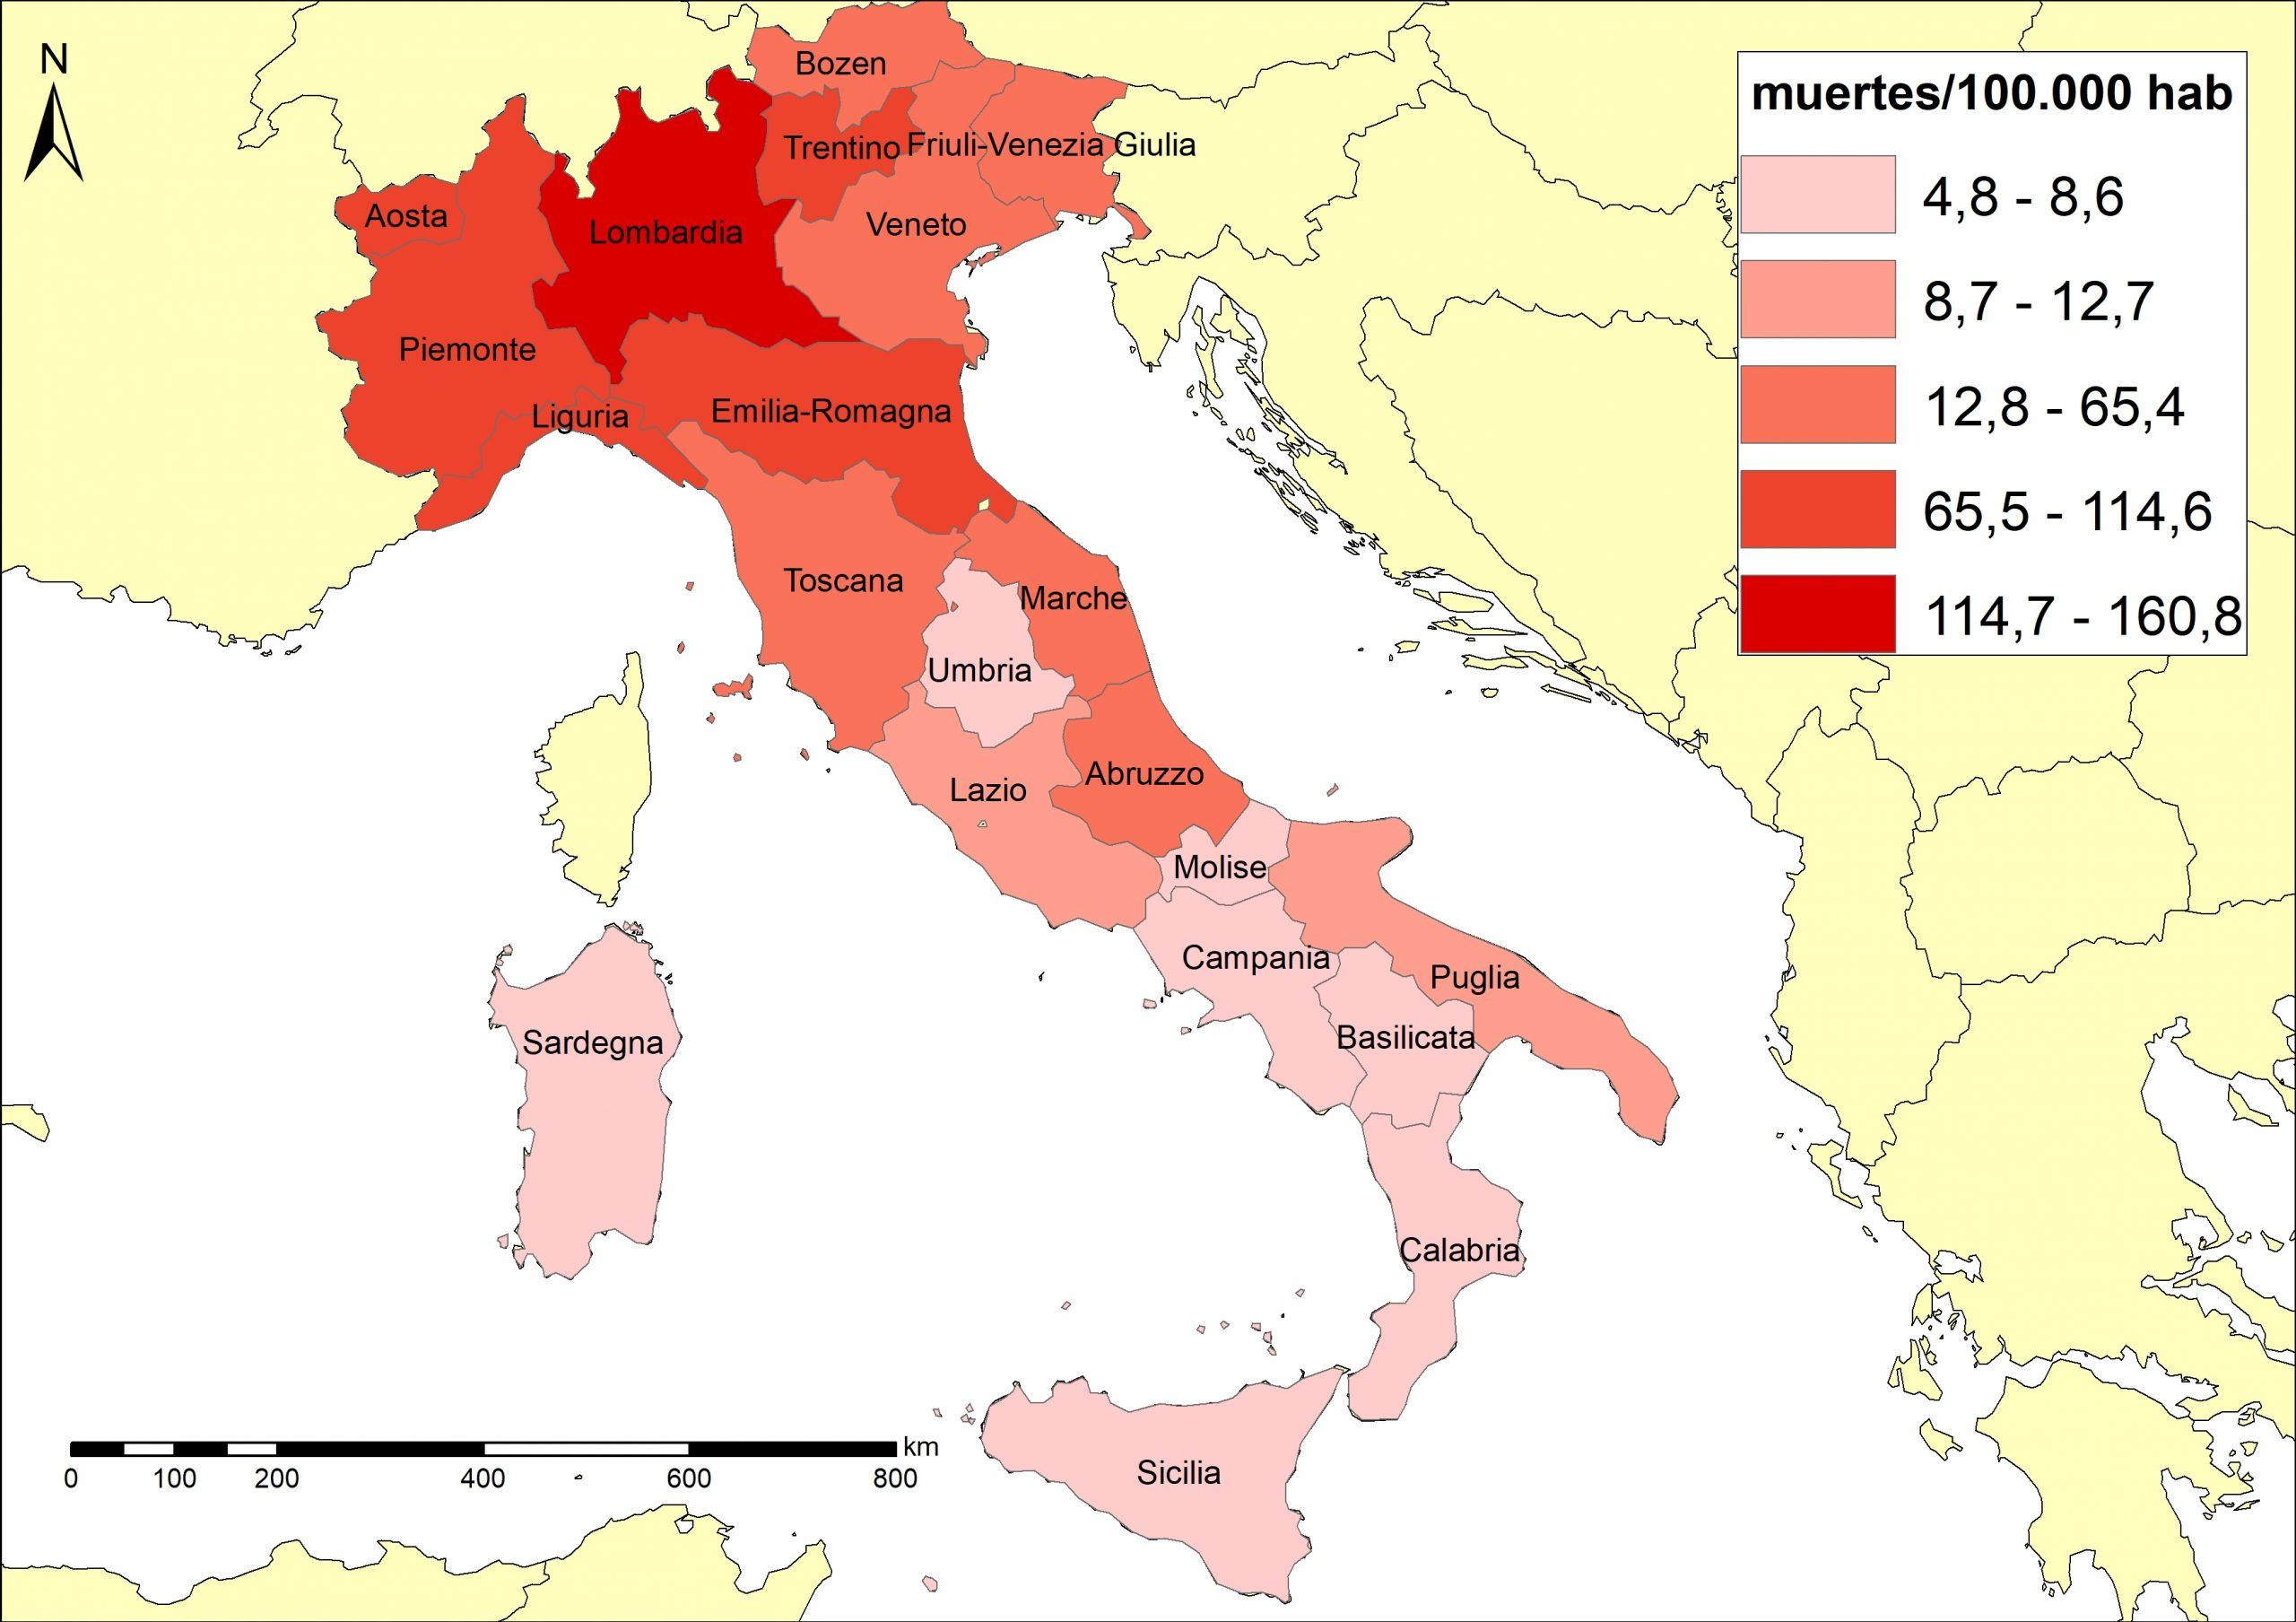 Figura 3. Mortalitat de la COVID-19 a Itàlia per regions (4/6/2020)